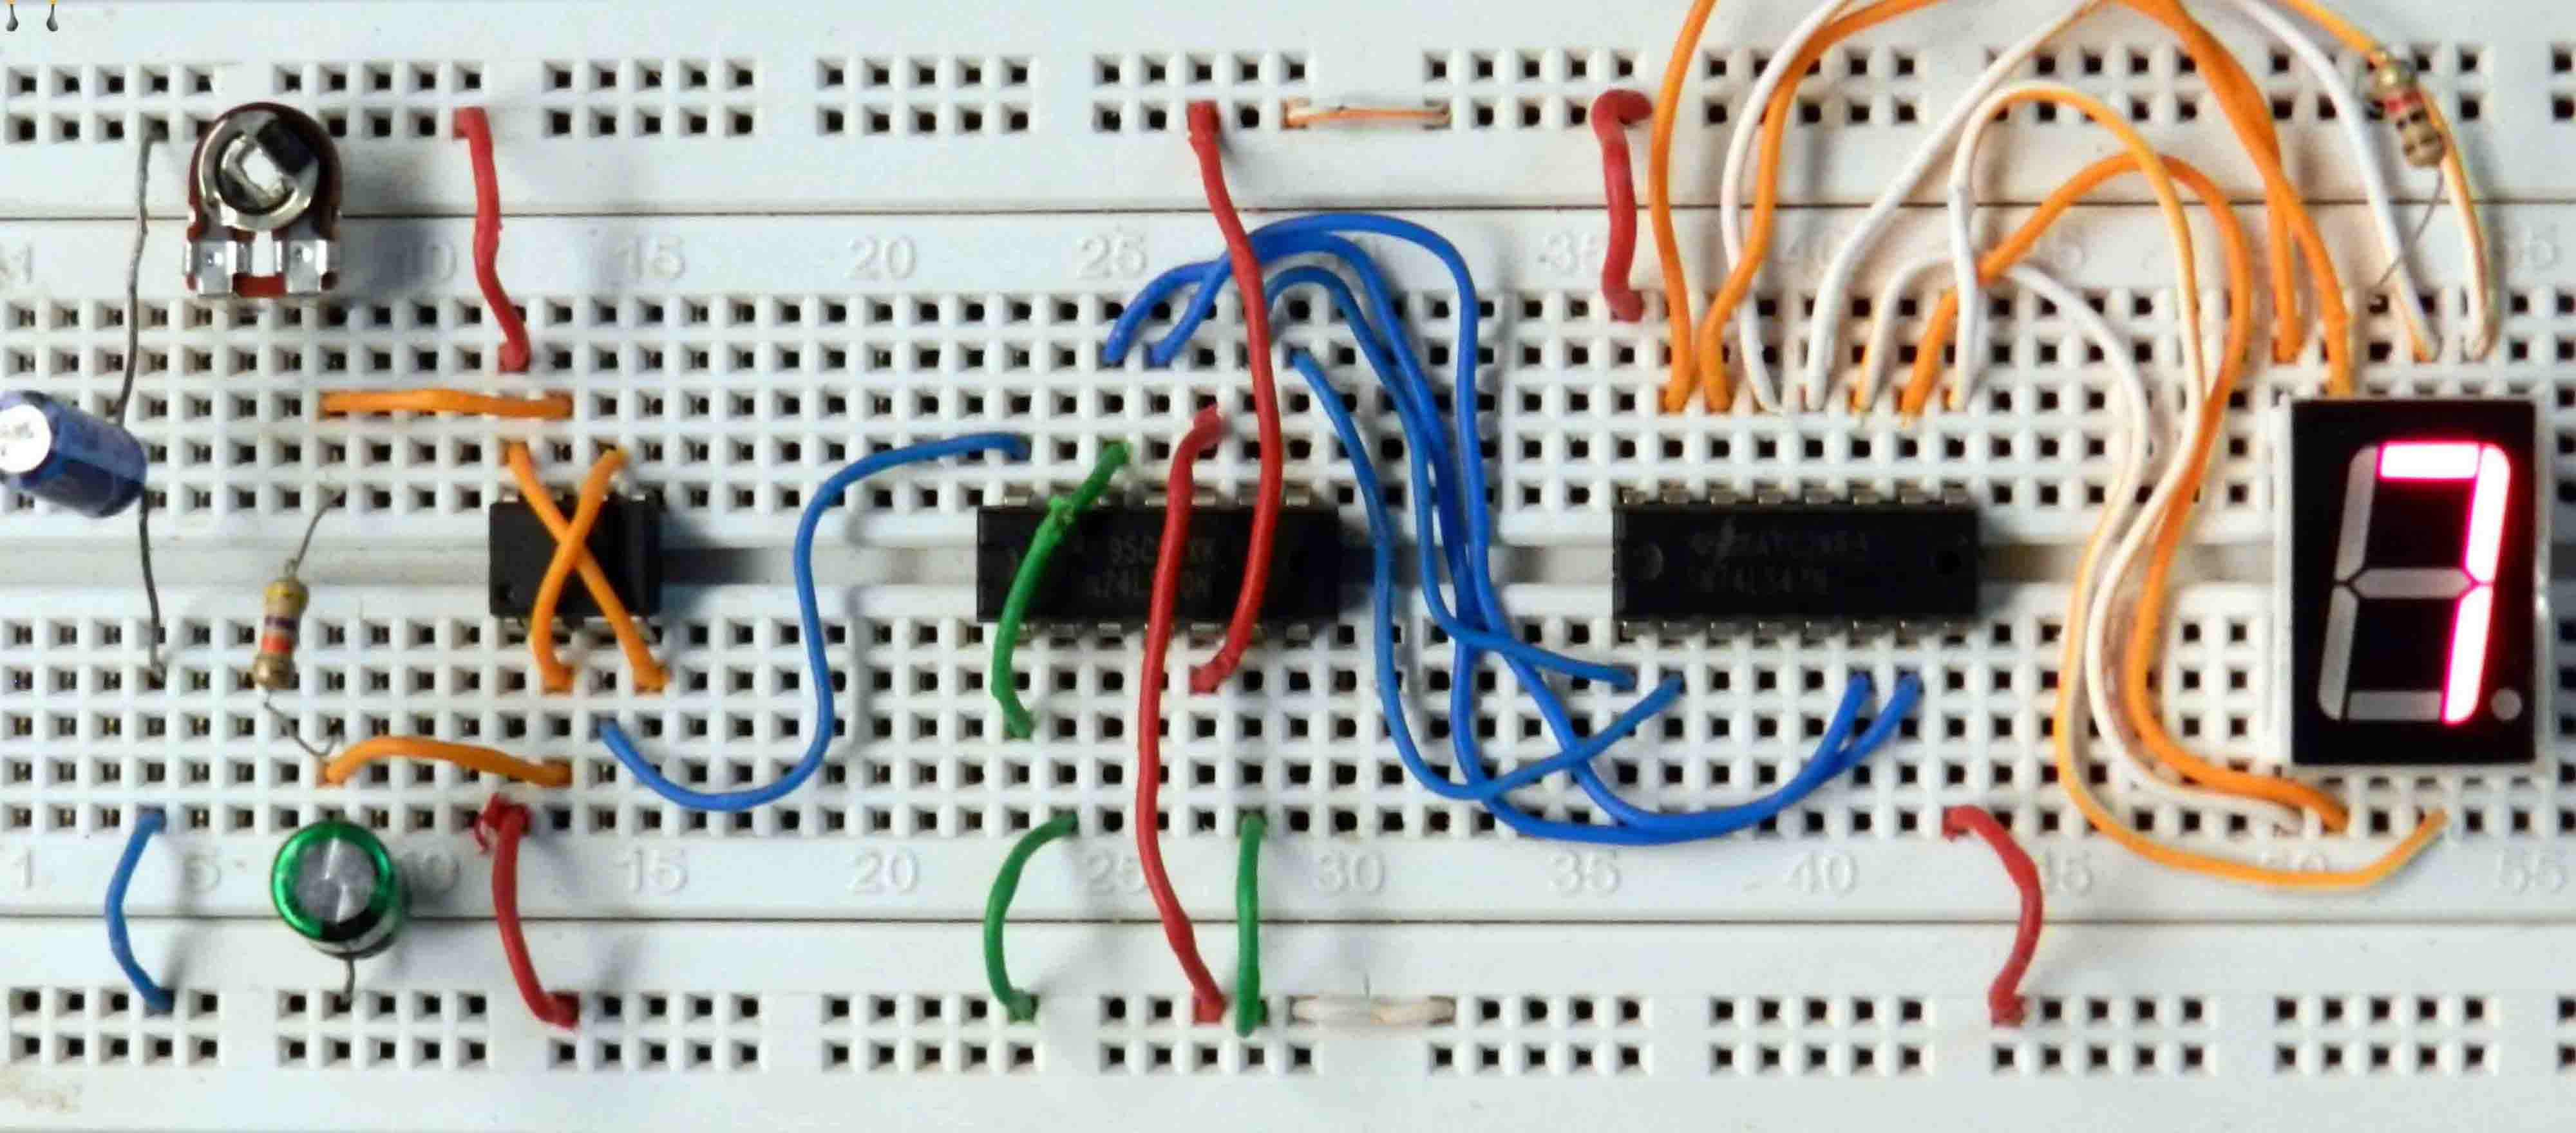 home rookie electronics electronics robotics projects rh development rookieelectronics com